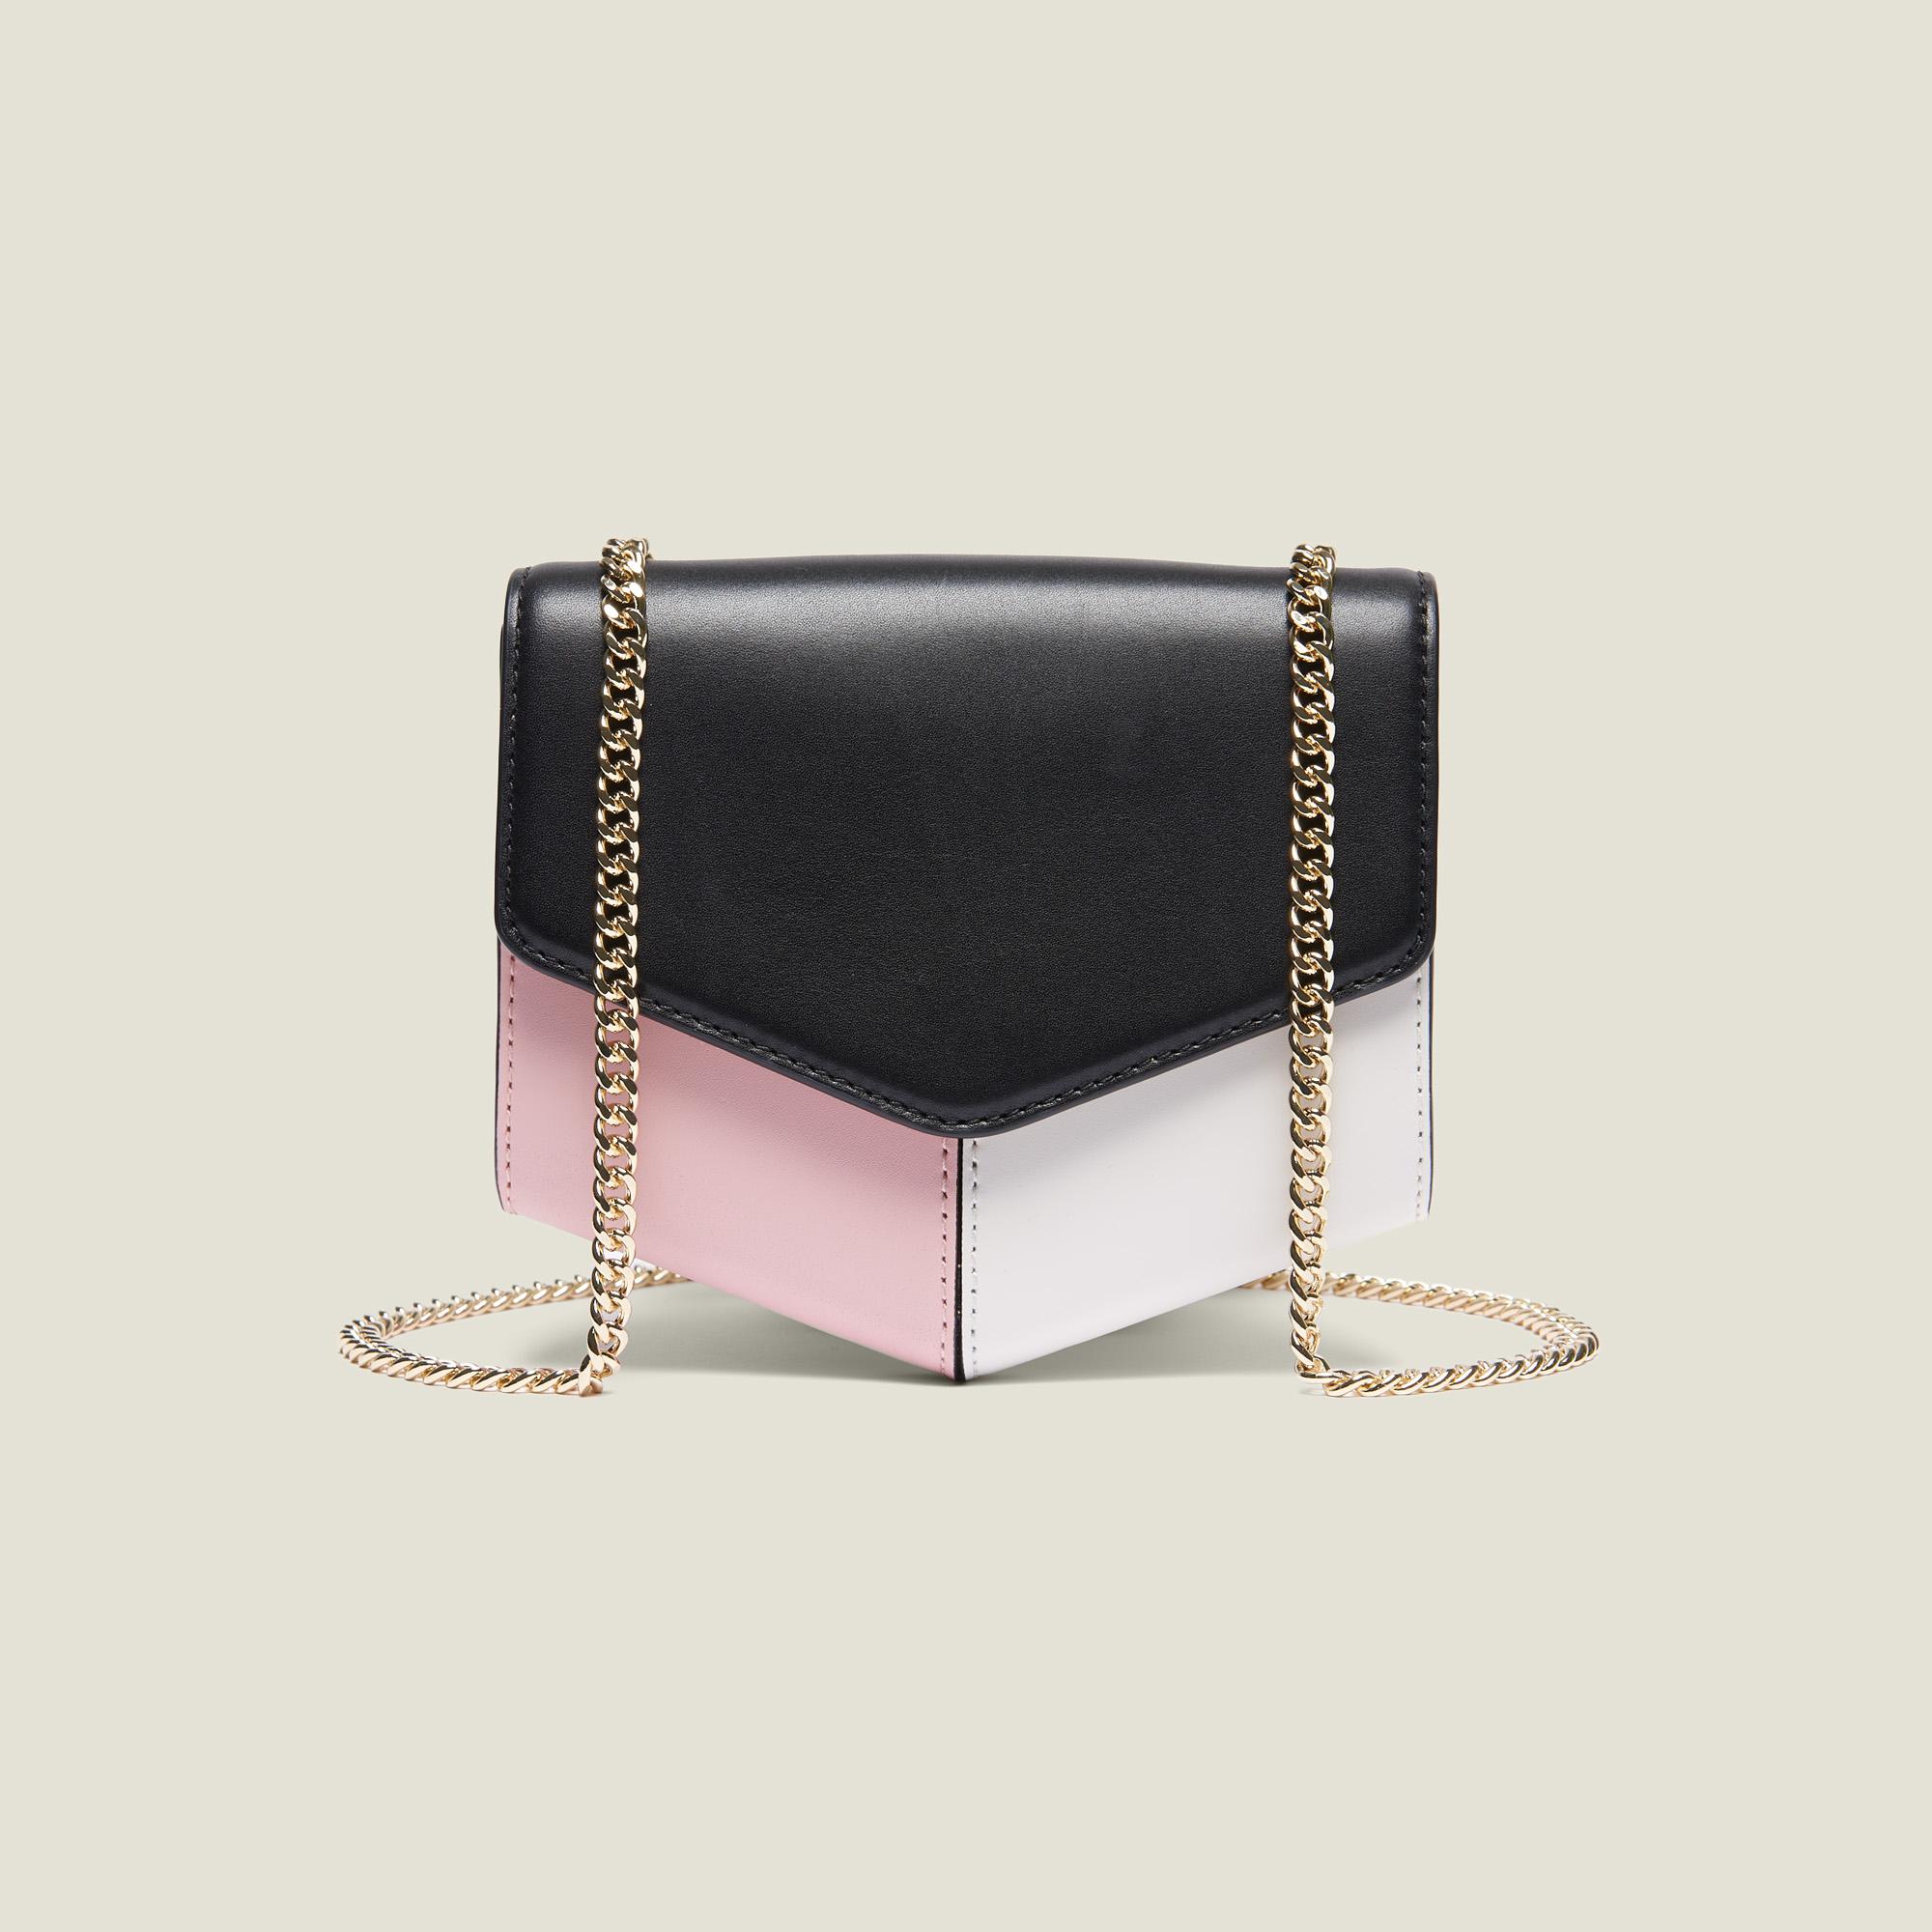 b4d773be90 ... Sac Lou Petit Modèle : My Lou Bag couleur Noir/Blanc/Pivoine ...